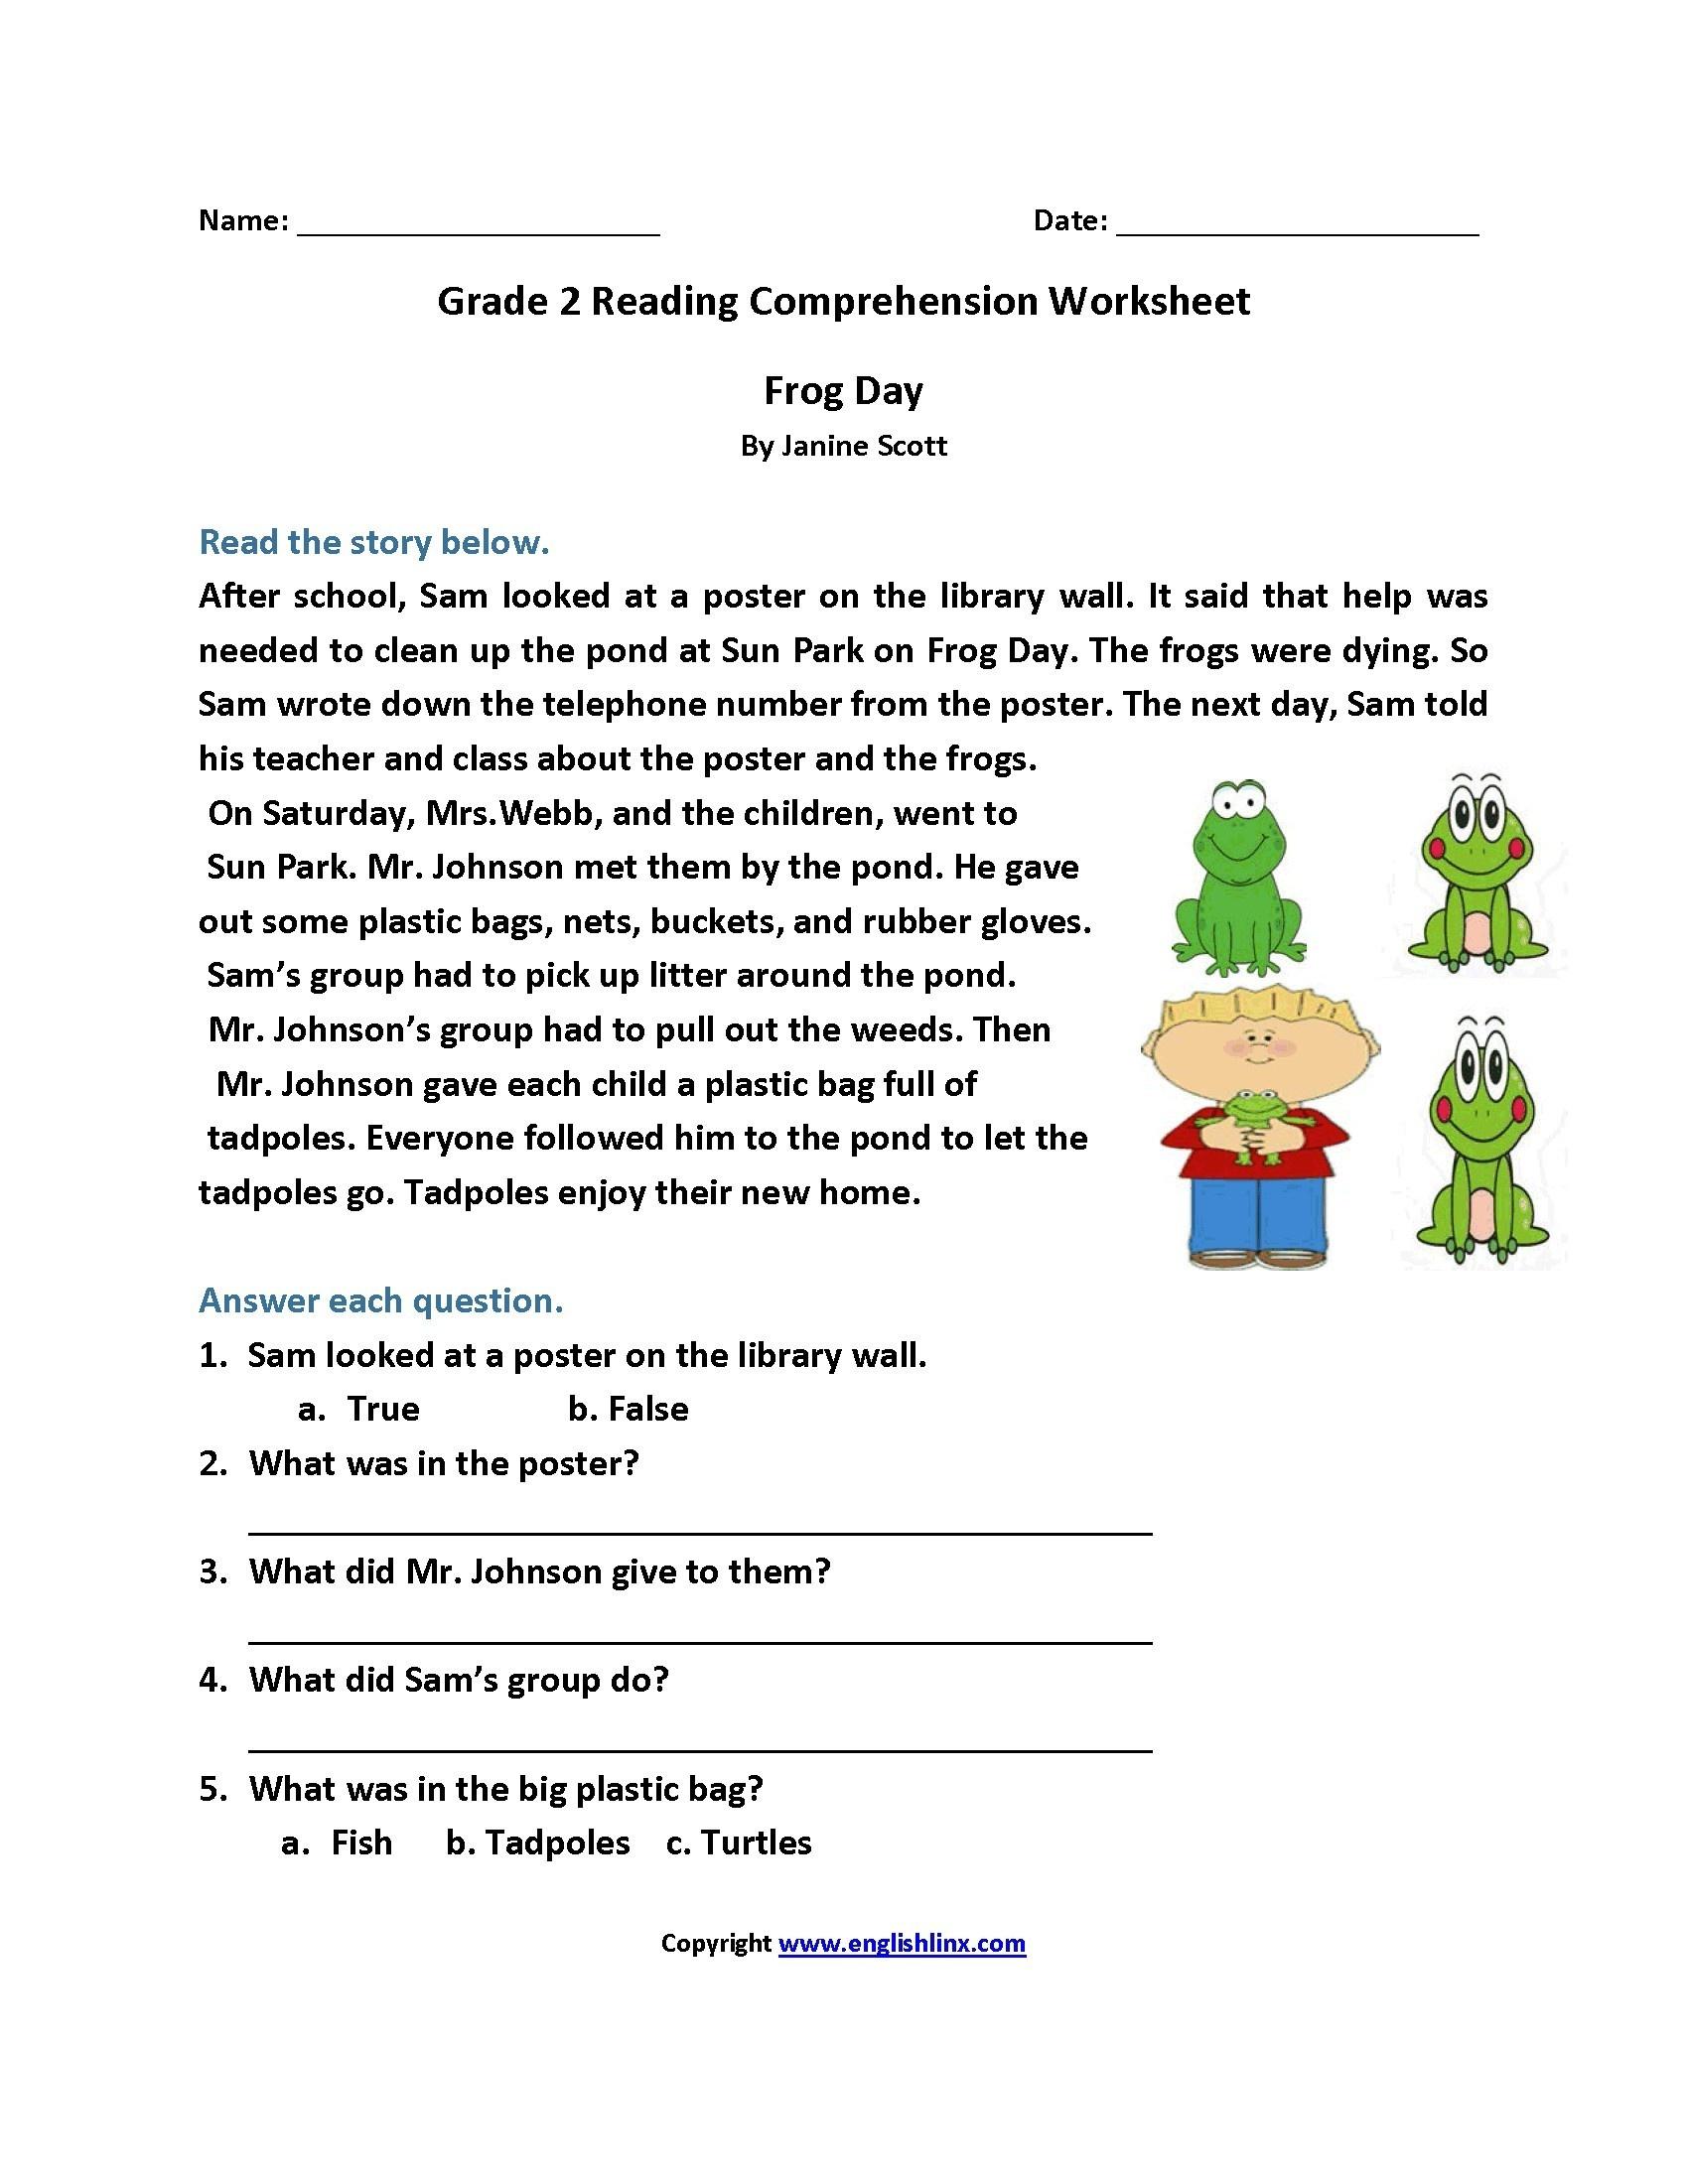 - 2st Grade Science Worksheet Printable Worksheets And Activities